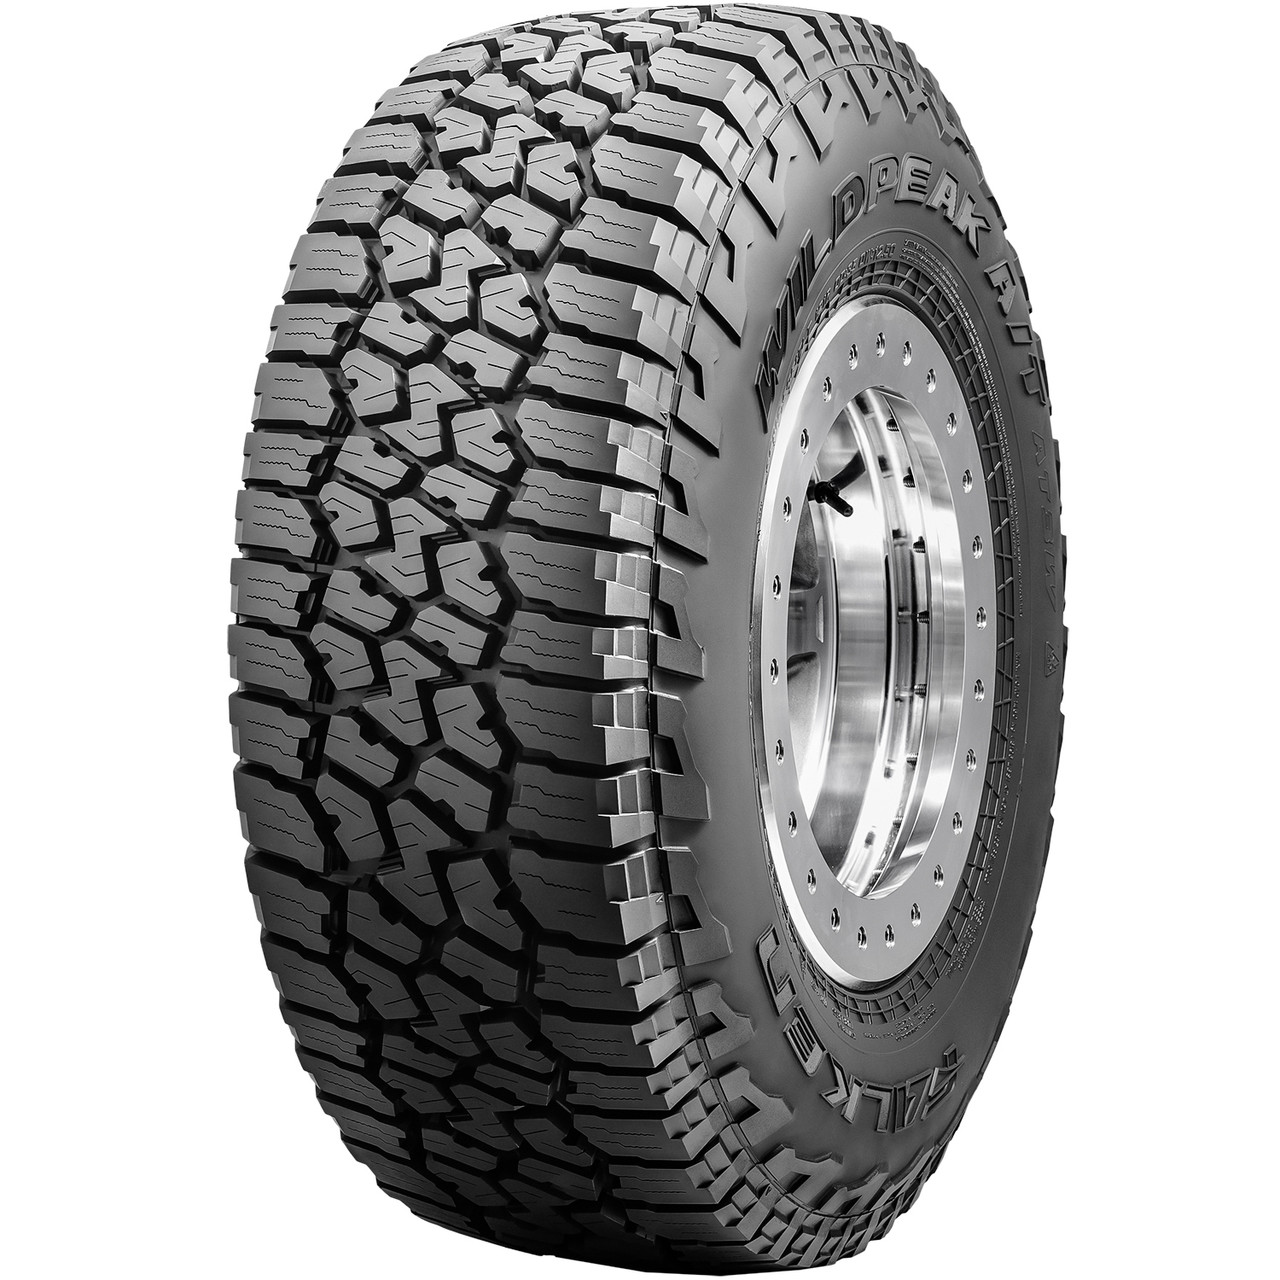 PriorityTire.com coupon: Falken Wildpeak A/T3W 32X11.50R15 C (6 Ply) All Terrain Tire